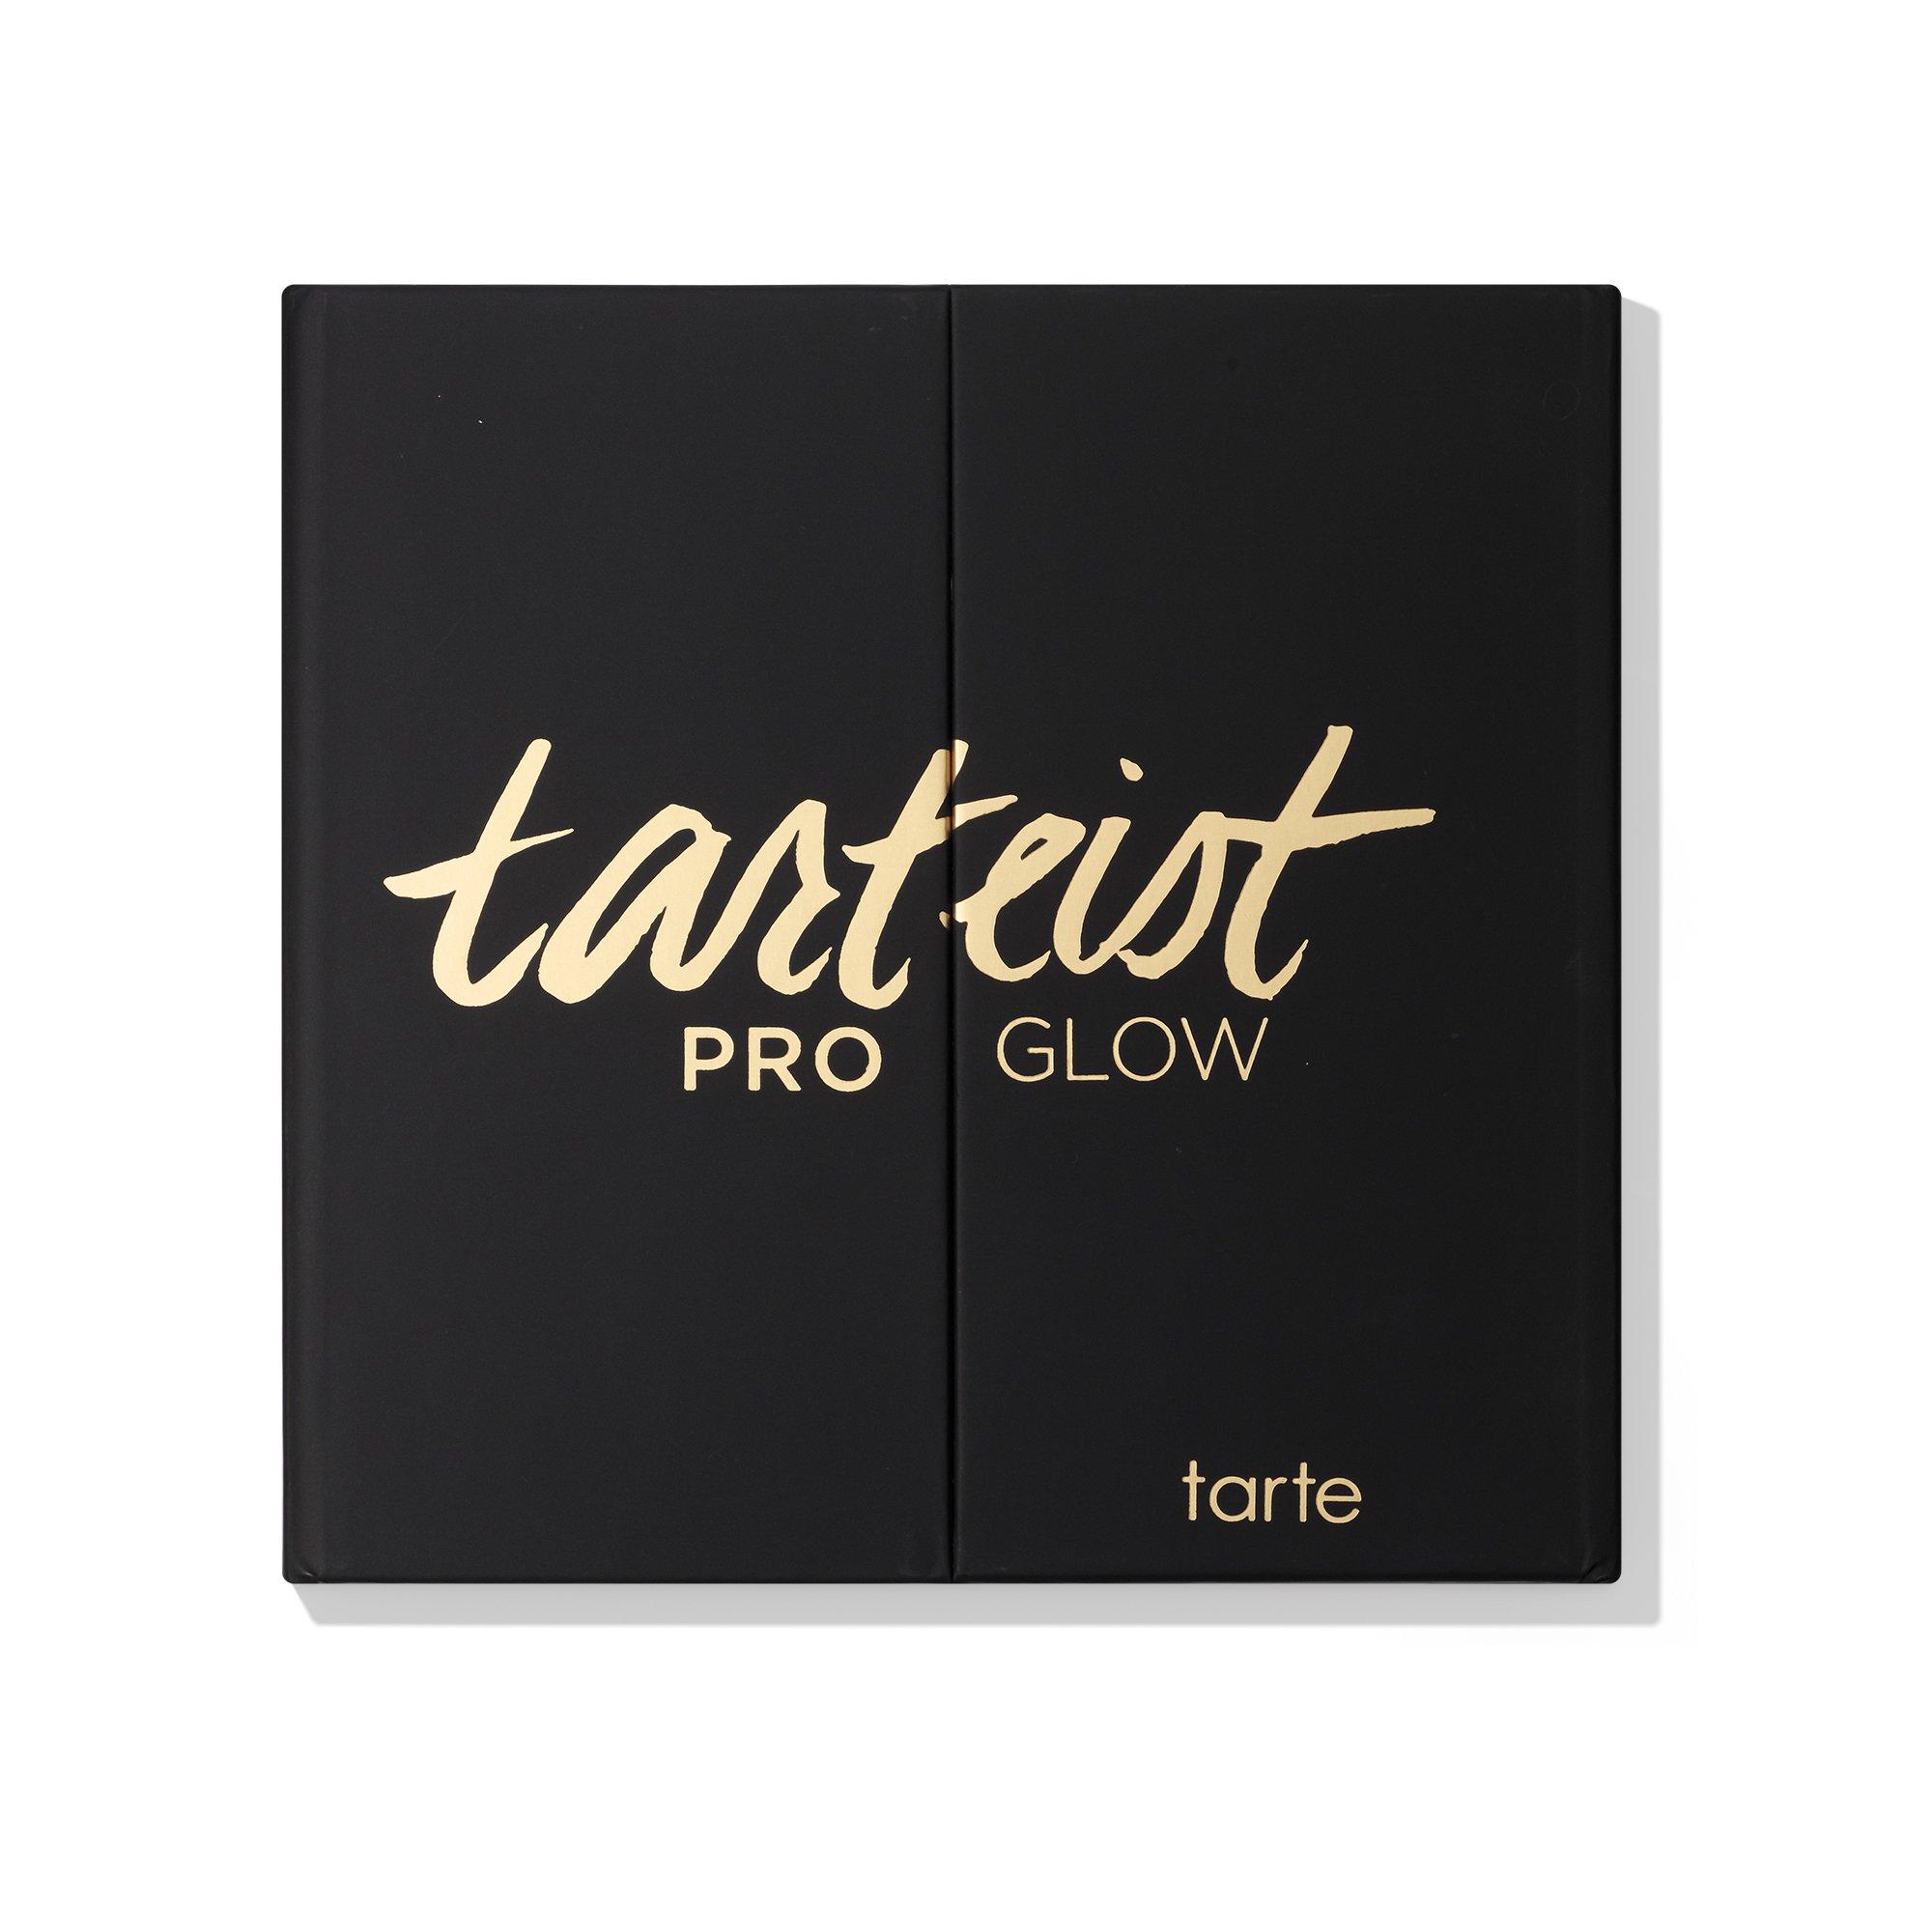 tarteist PRO glow highlight contour palette by Tarte (Image #2)